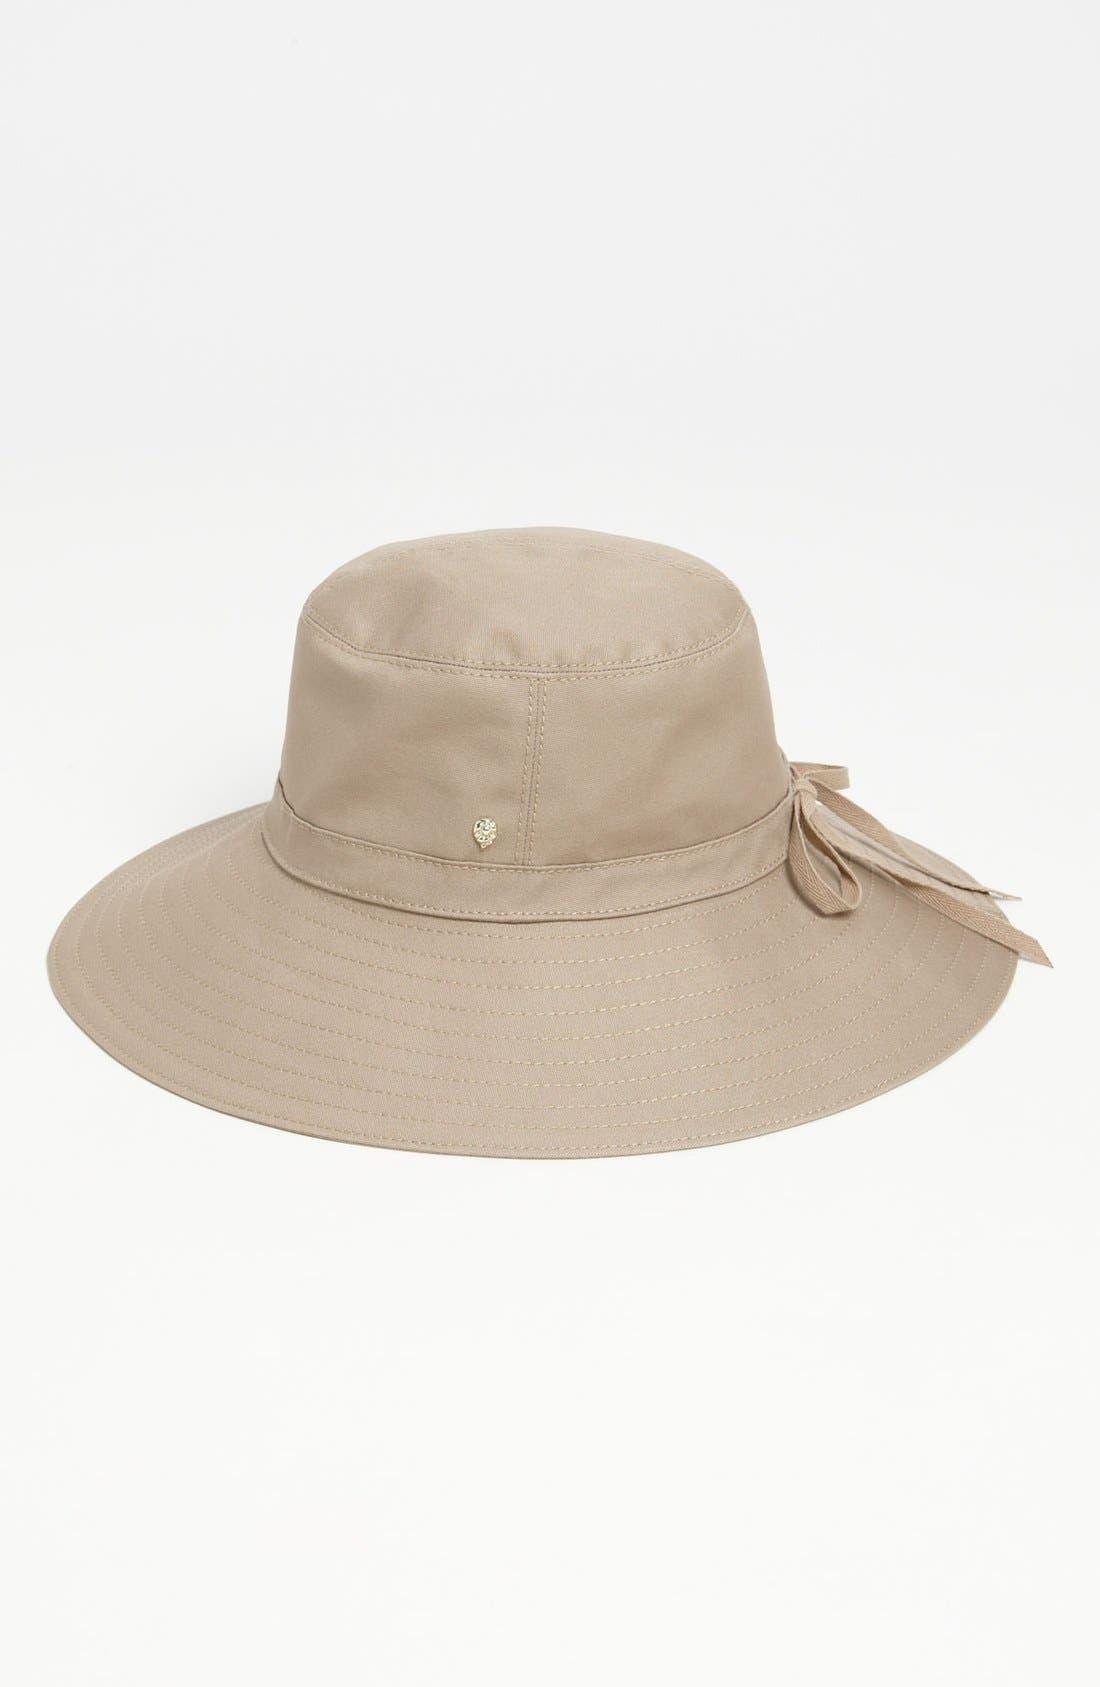 Alternate Image 1 Selected - Helen Kaminski 'Istria' Canvas Sun Hat